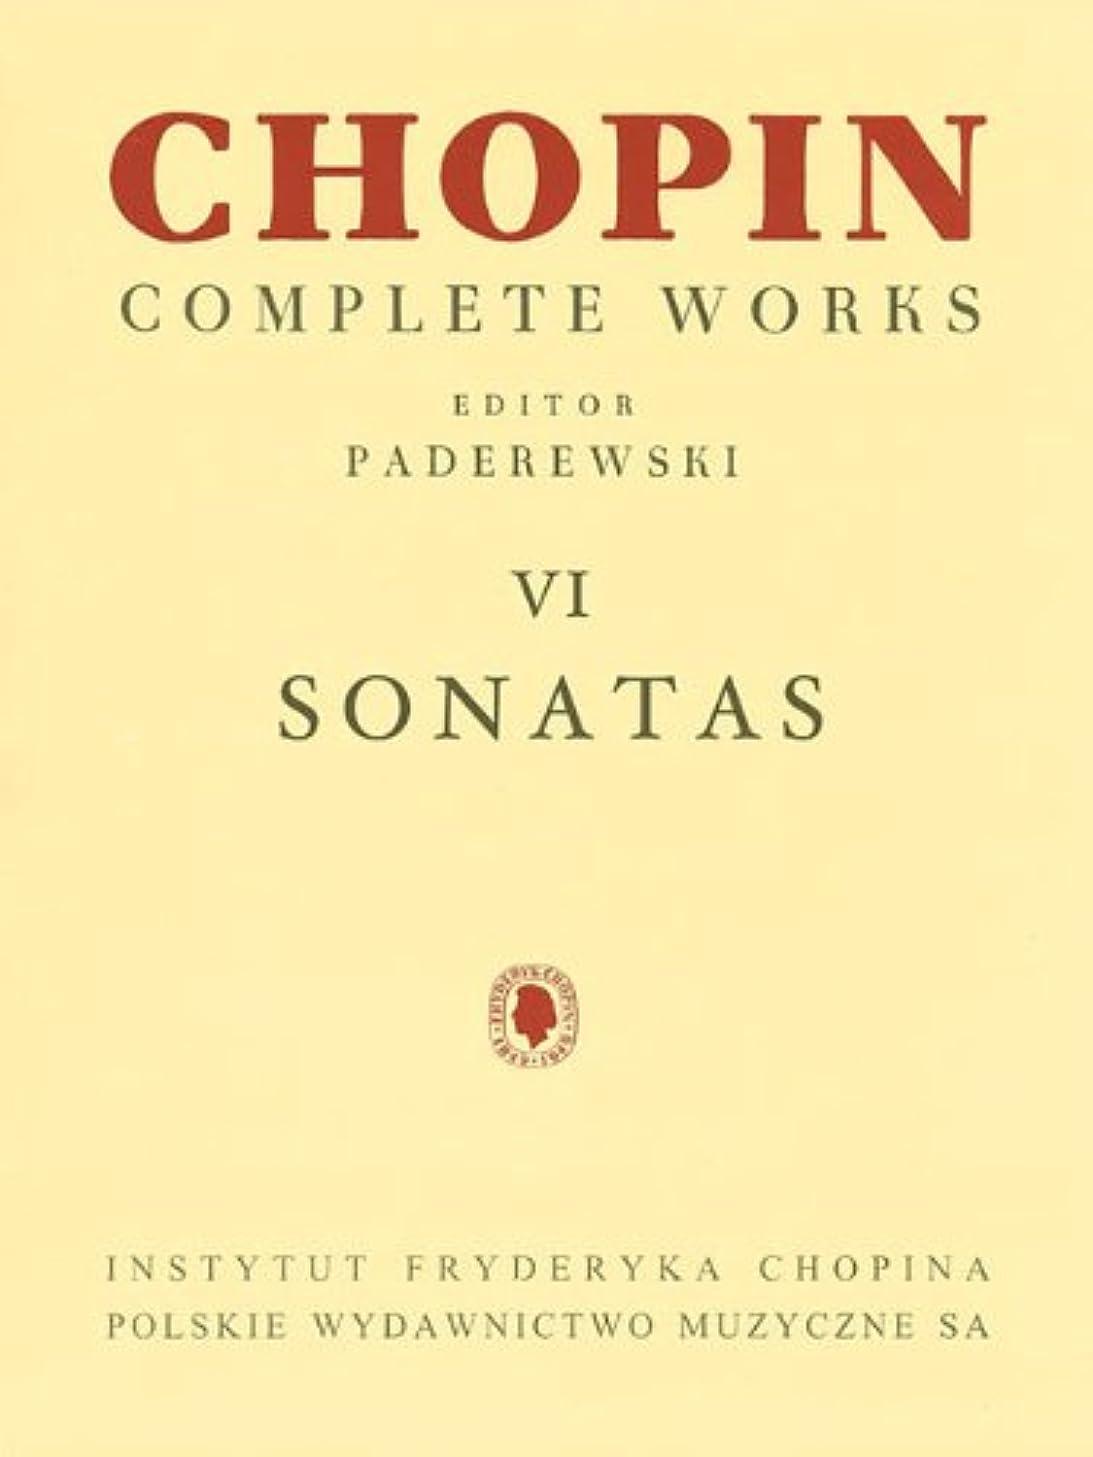 Sonatas: Chopin Complete Works Vol. VI (Fryderyk Chopin Complete Works)